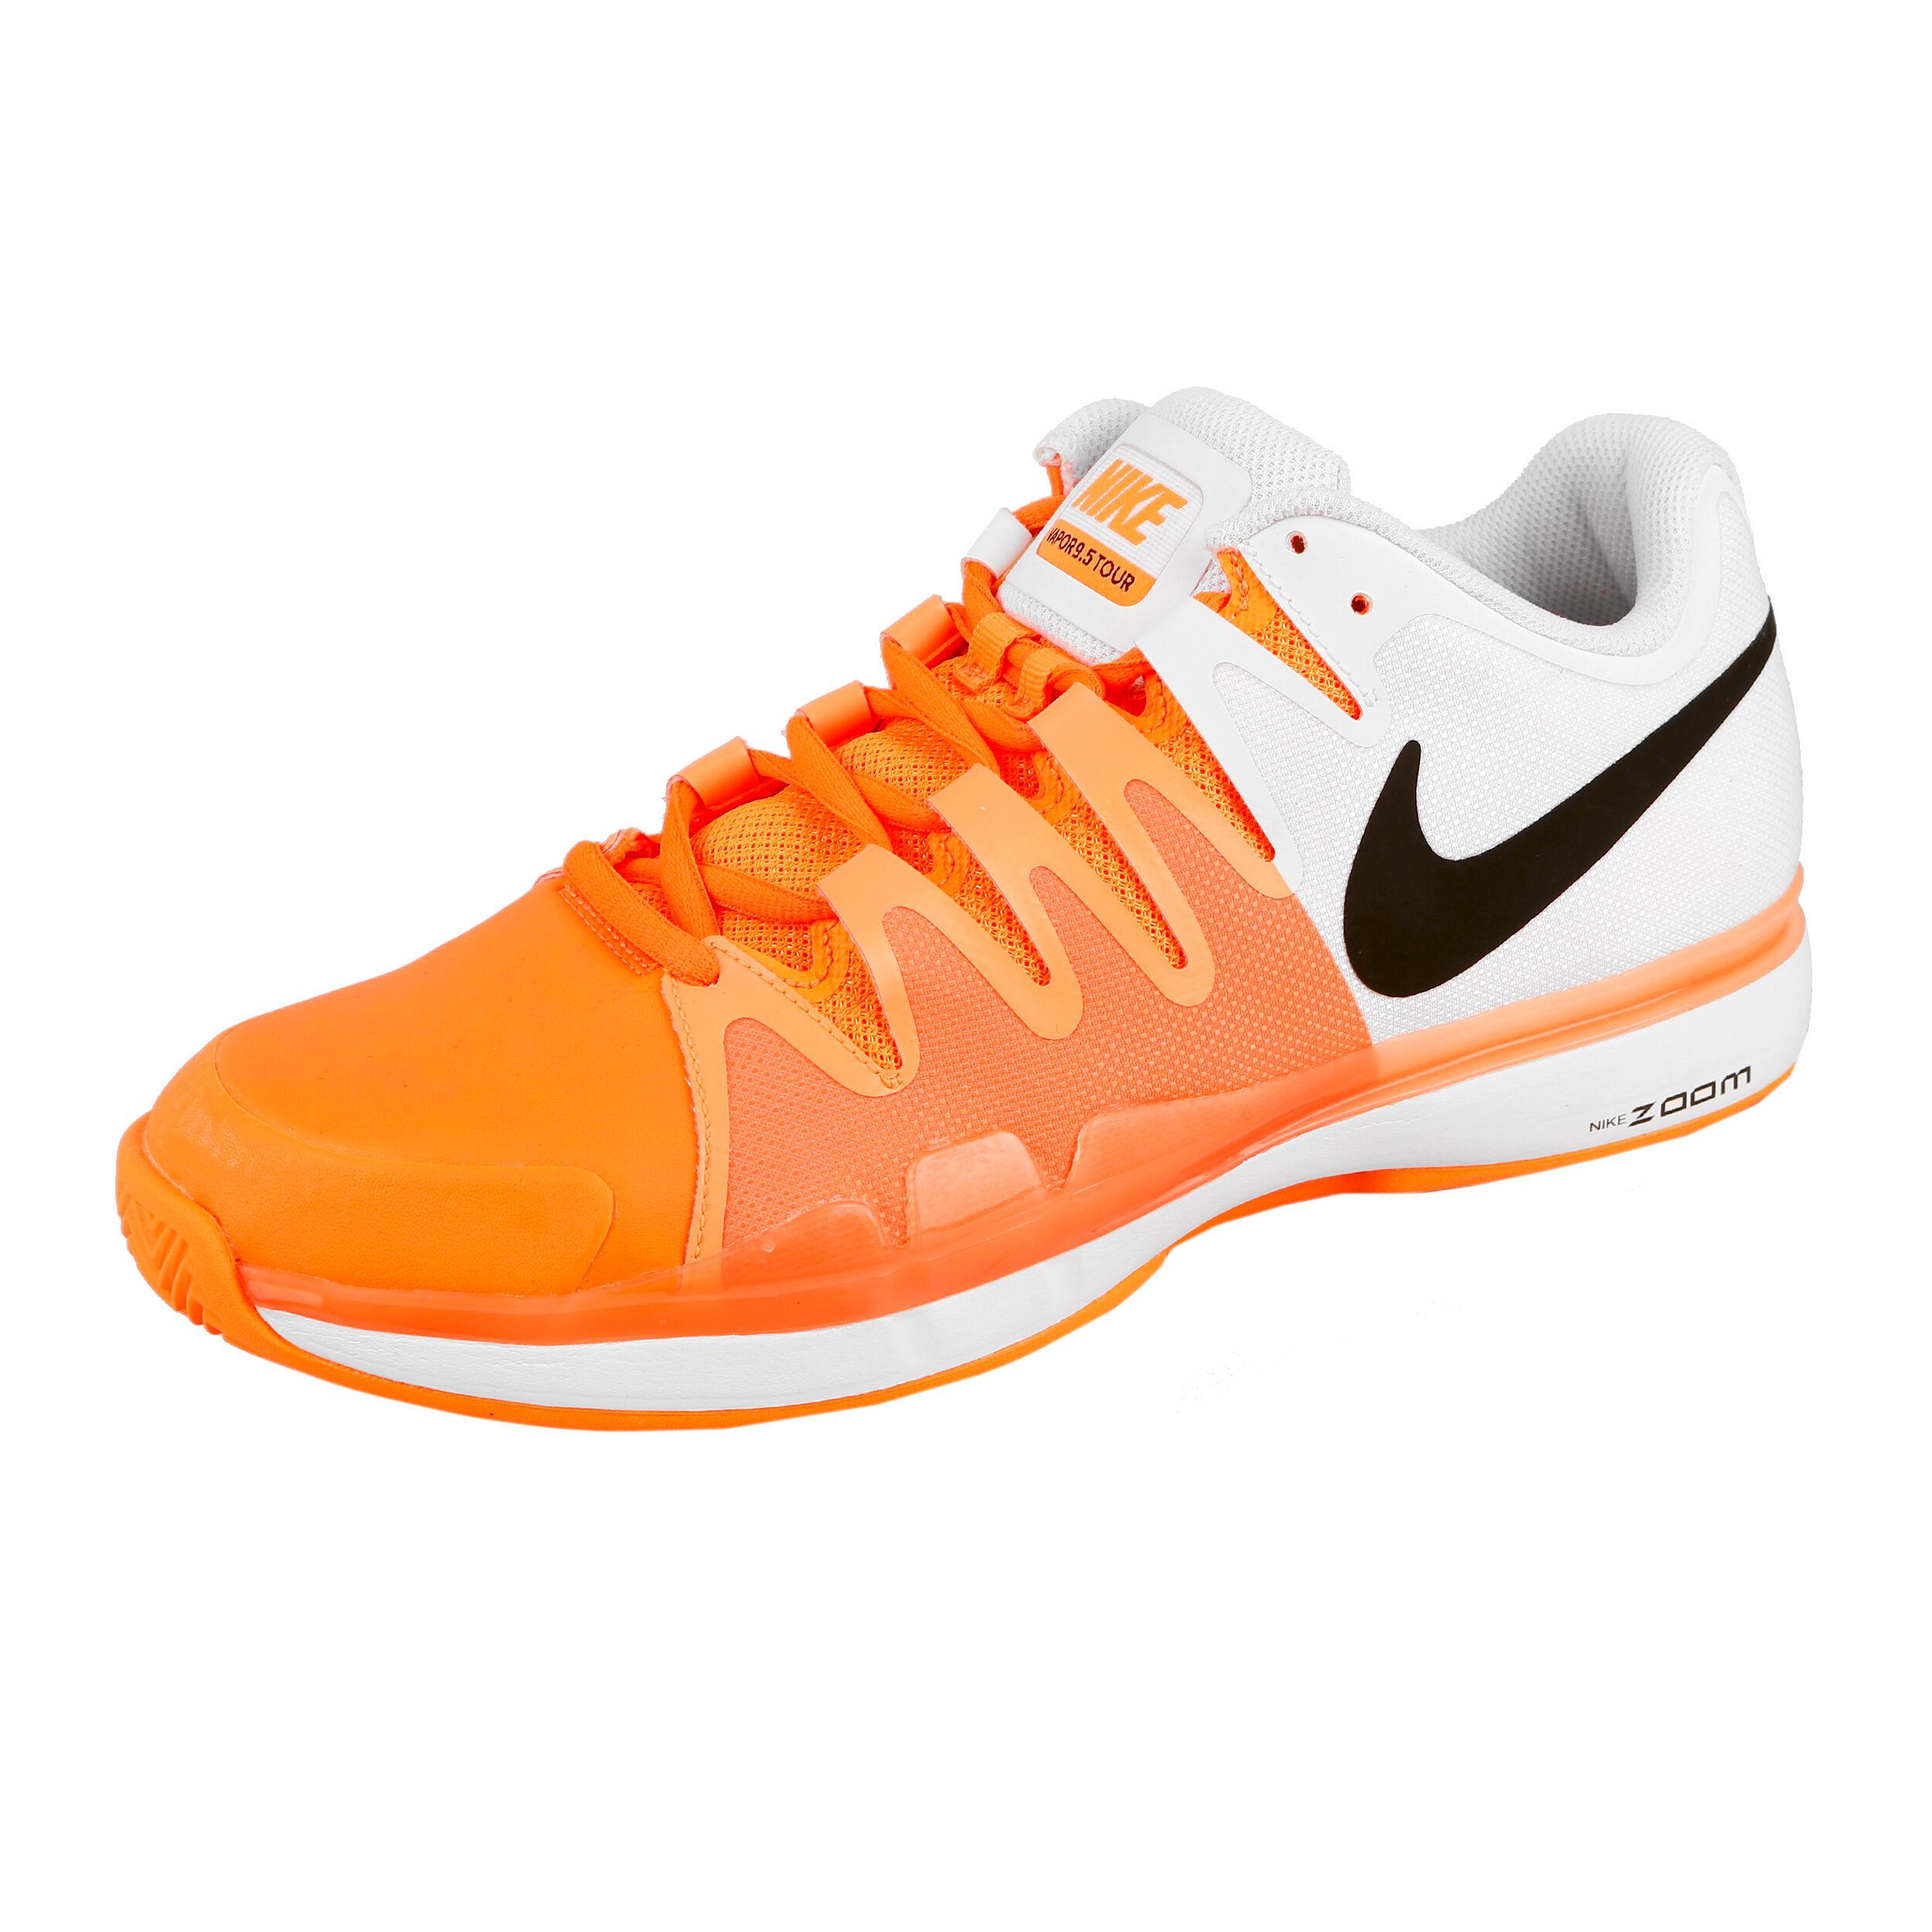 Nike Zoom Vapor 9.5 Tour Clay Scarpa Per Terra Rossa Uomini Arancione, Bianco